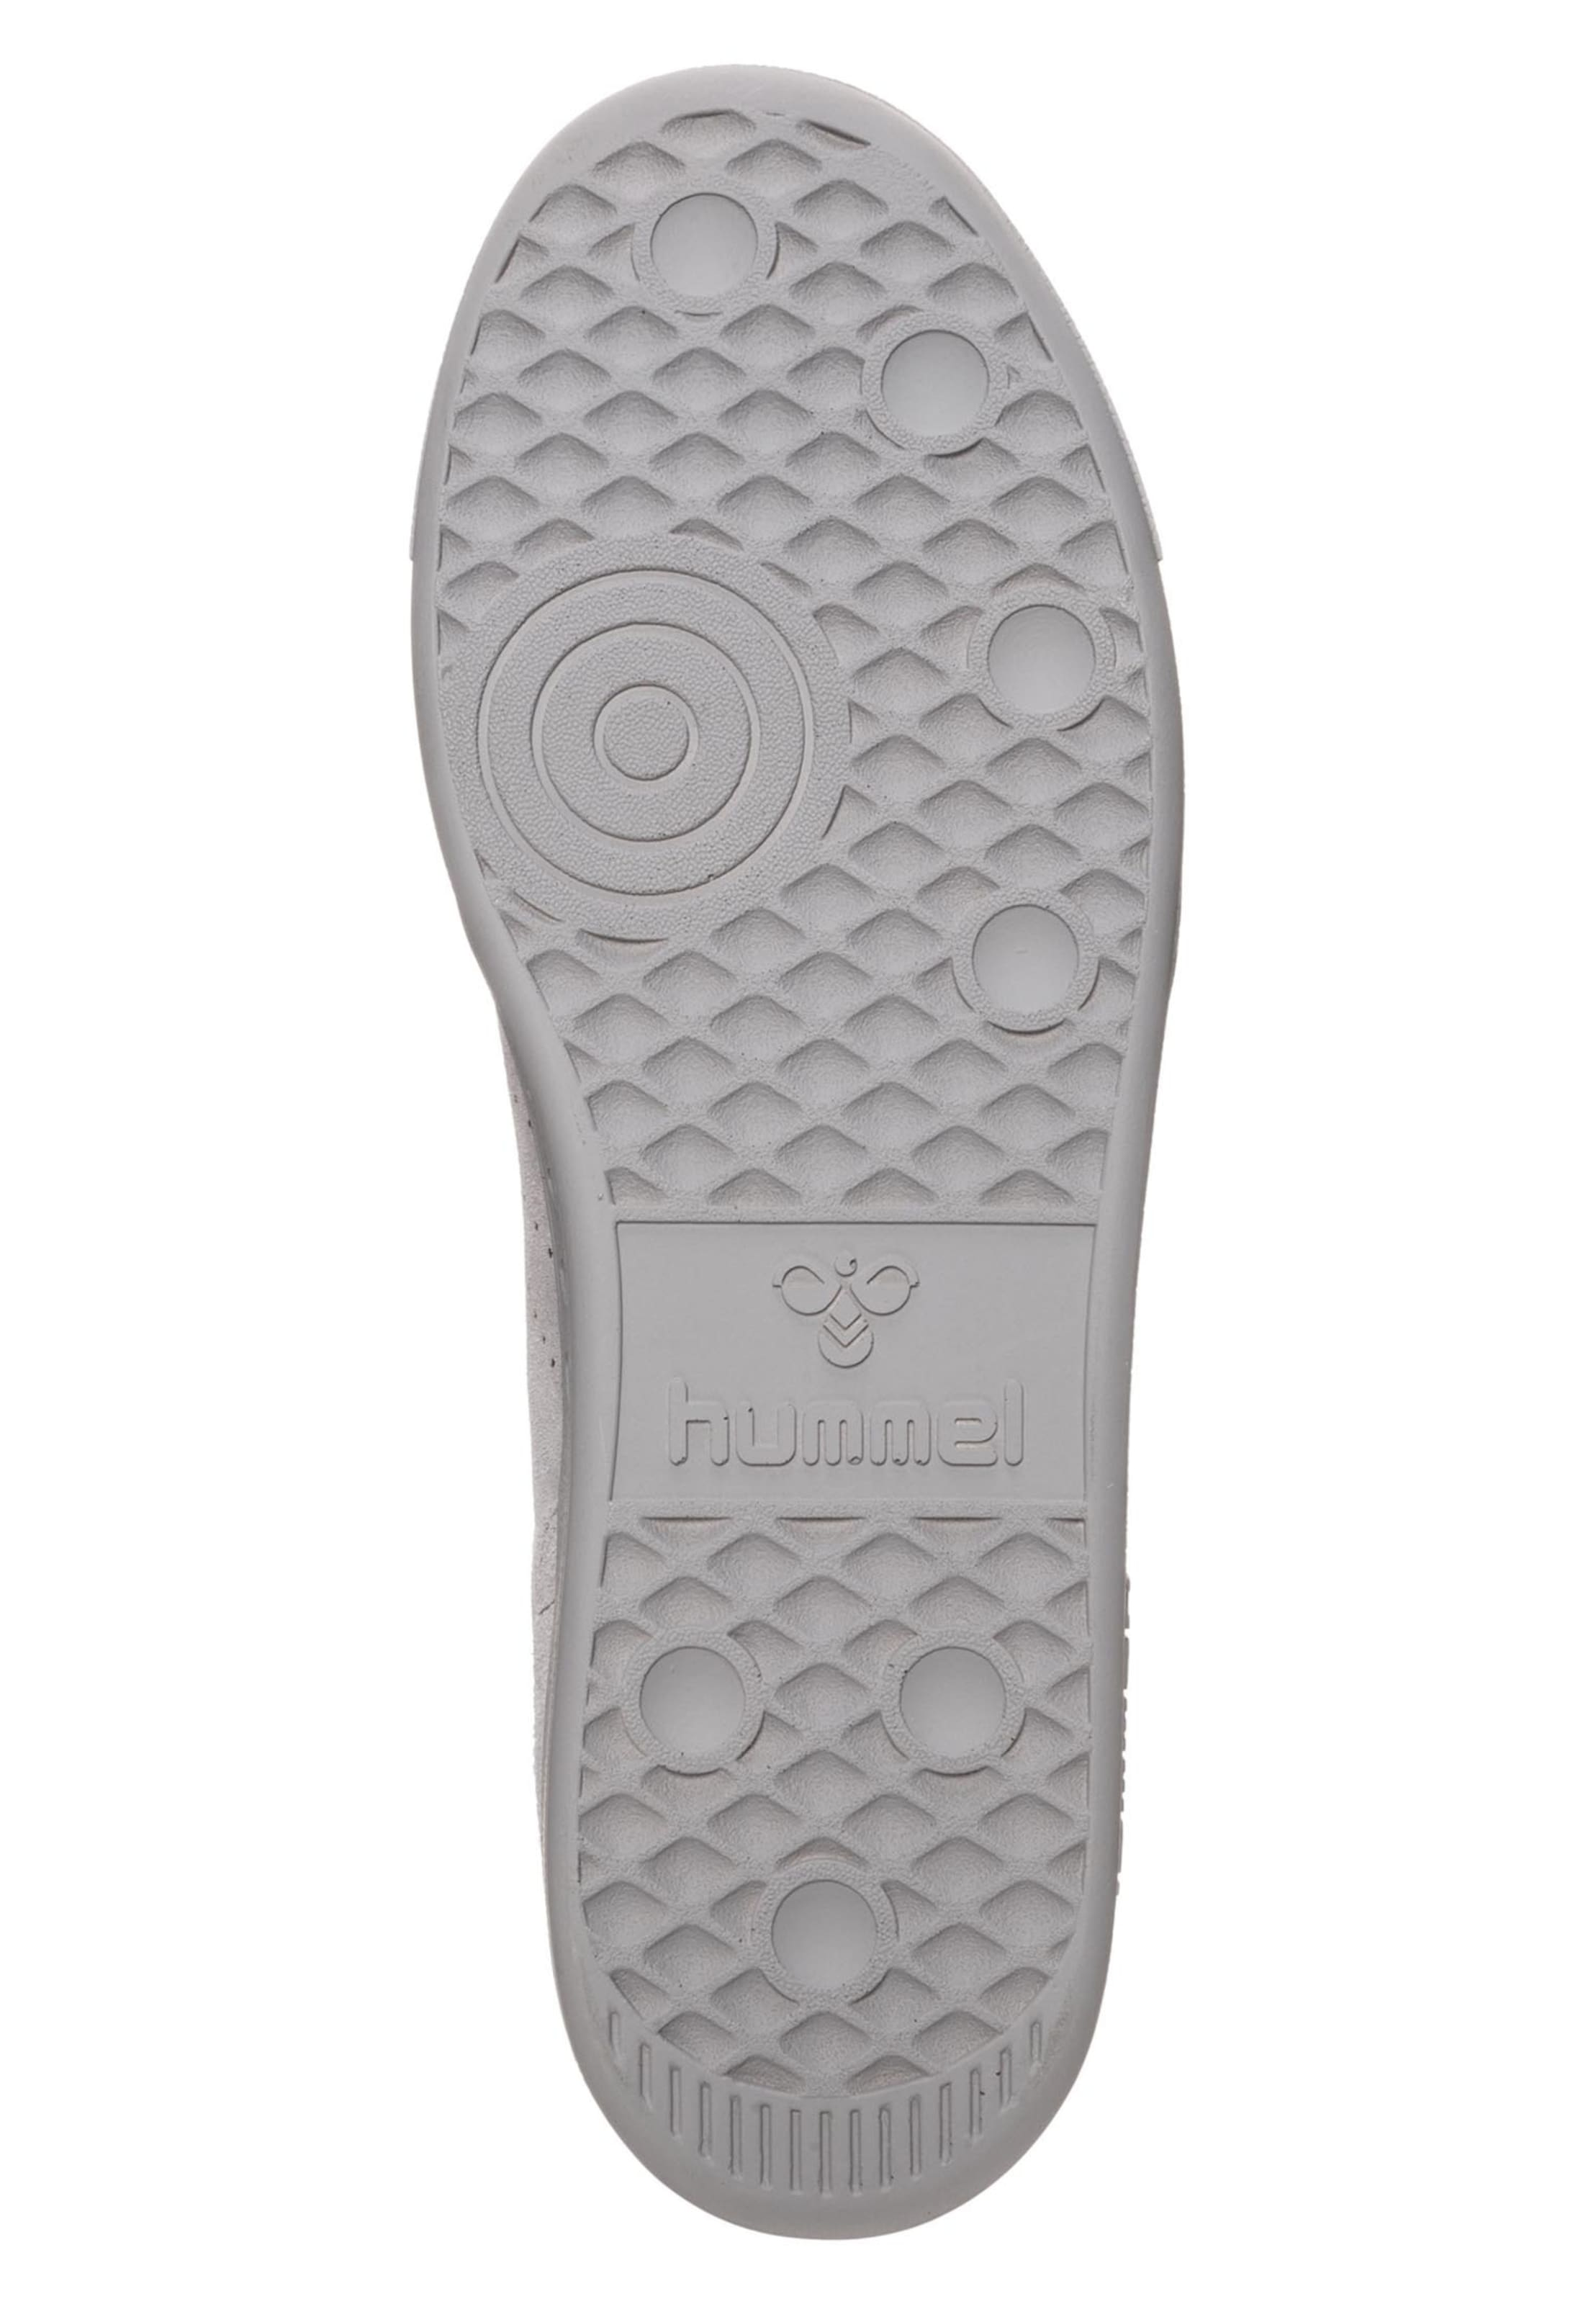 De Trimm' En Hummel Chaussure 'super Gris Sport wZOPk8n0NX